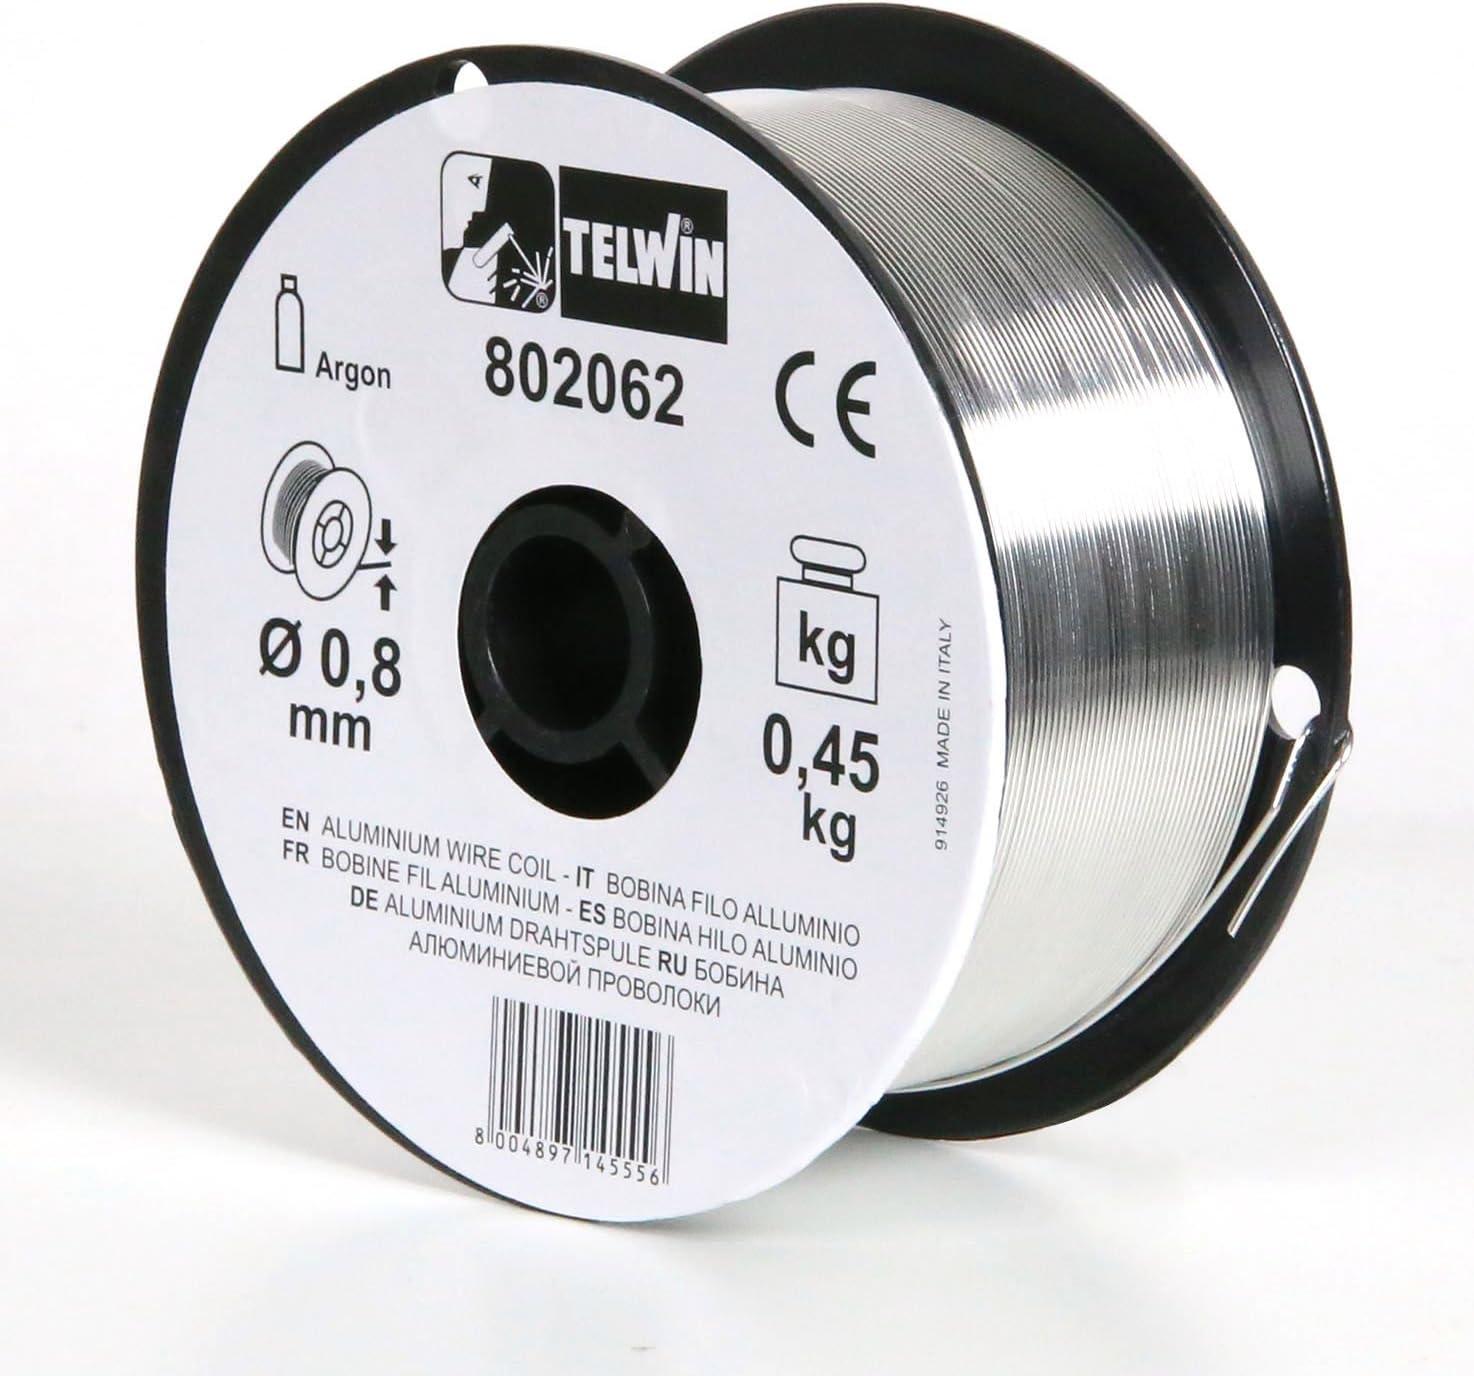 Telwin 802062 - Bobina de hilo aluminio Ø 0,8 (0,45 kg), Gr